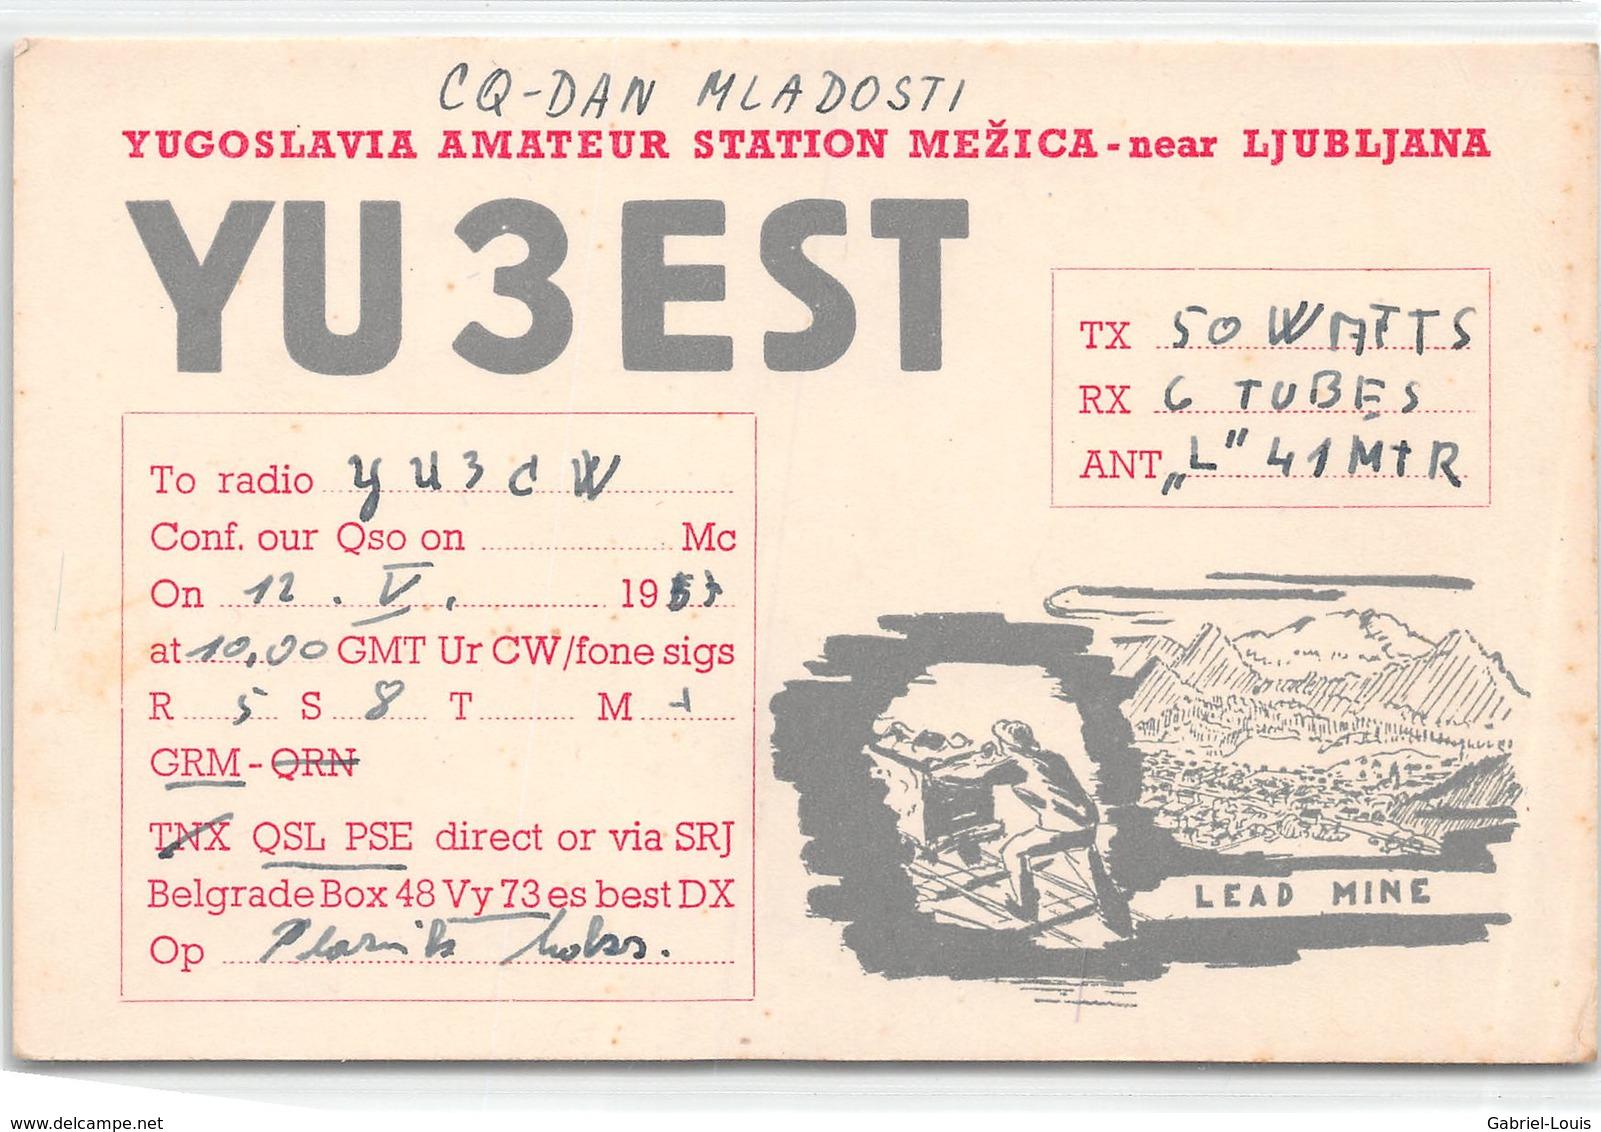 QSL Cards - YU3EST - YU 3 Est - Yugoslavia Amateur Station Mezica - Near Ljubljana - Lead Mine- Sloveija - 1957 - Radio Amatoriale